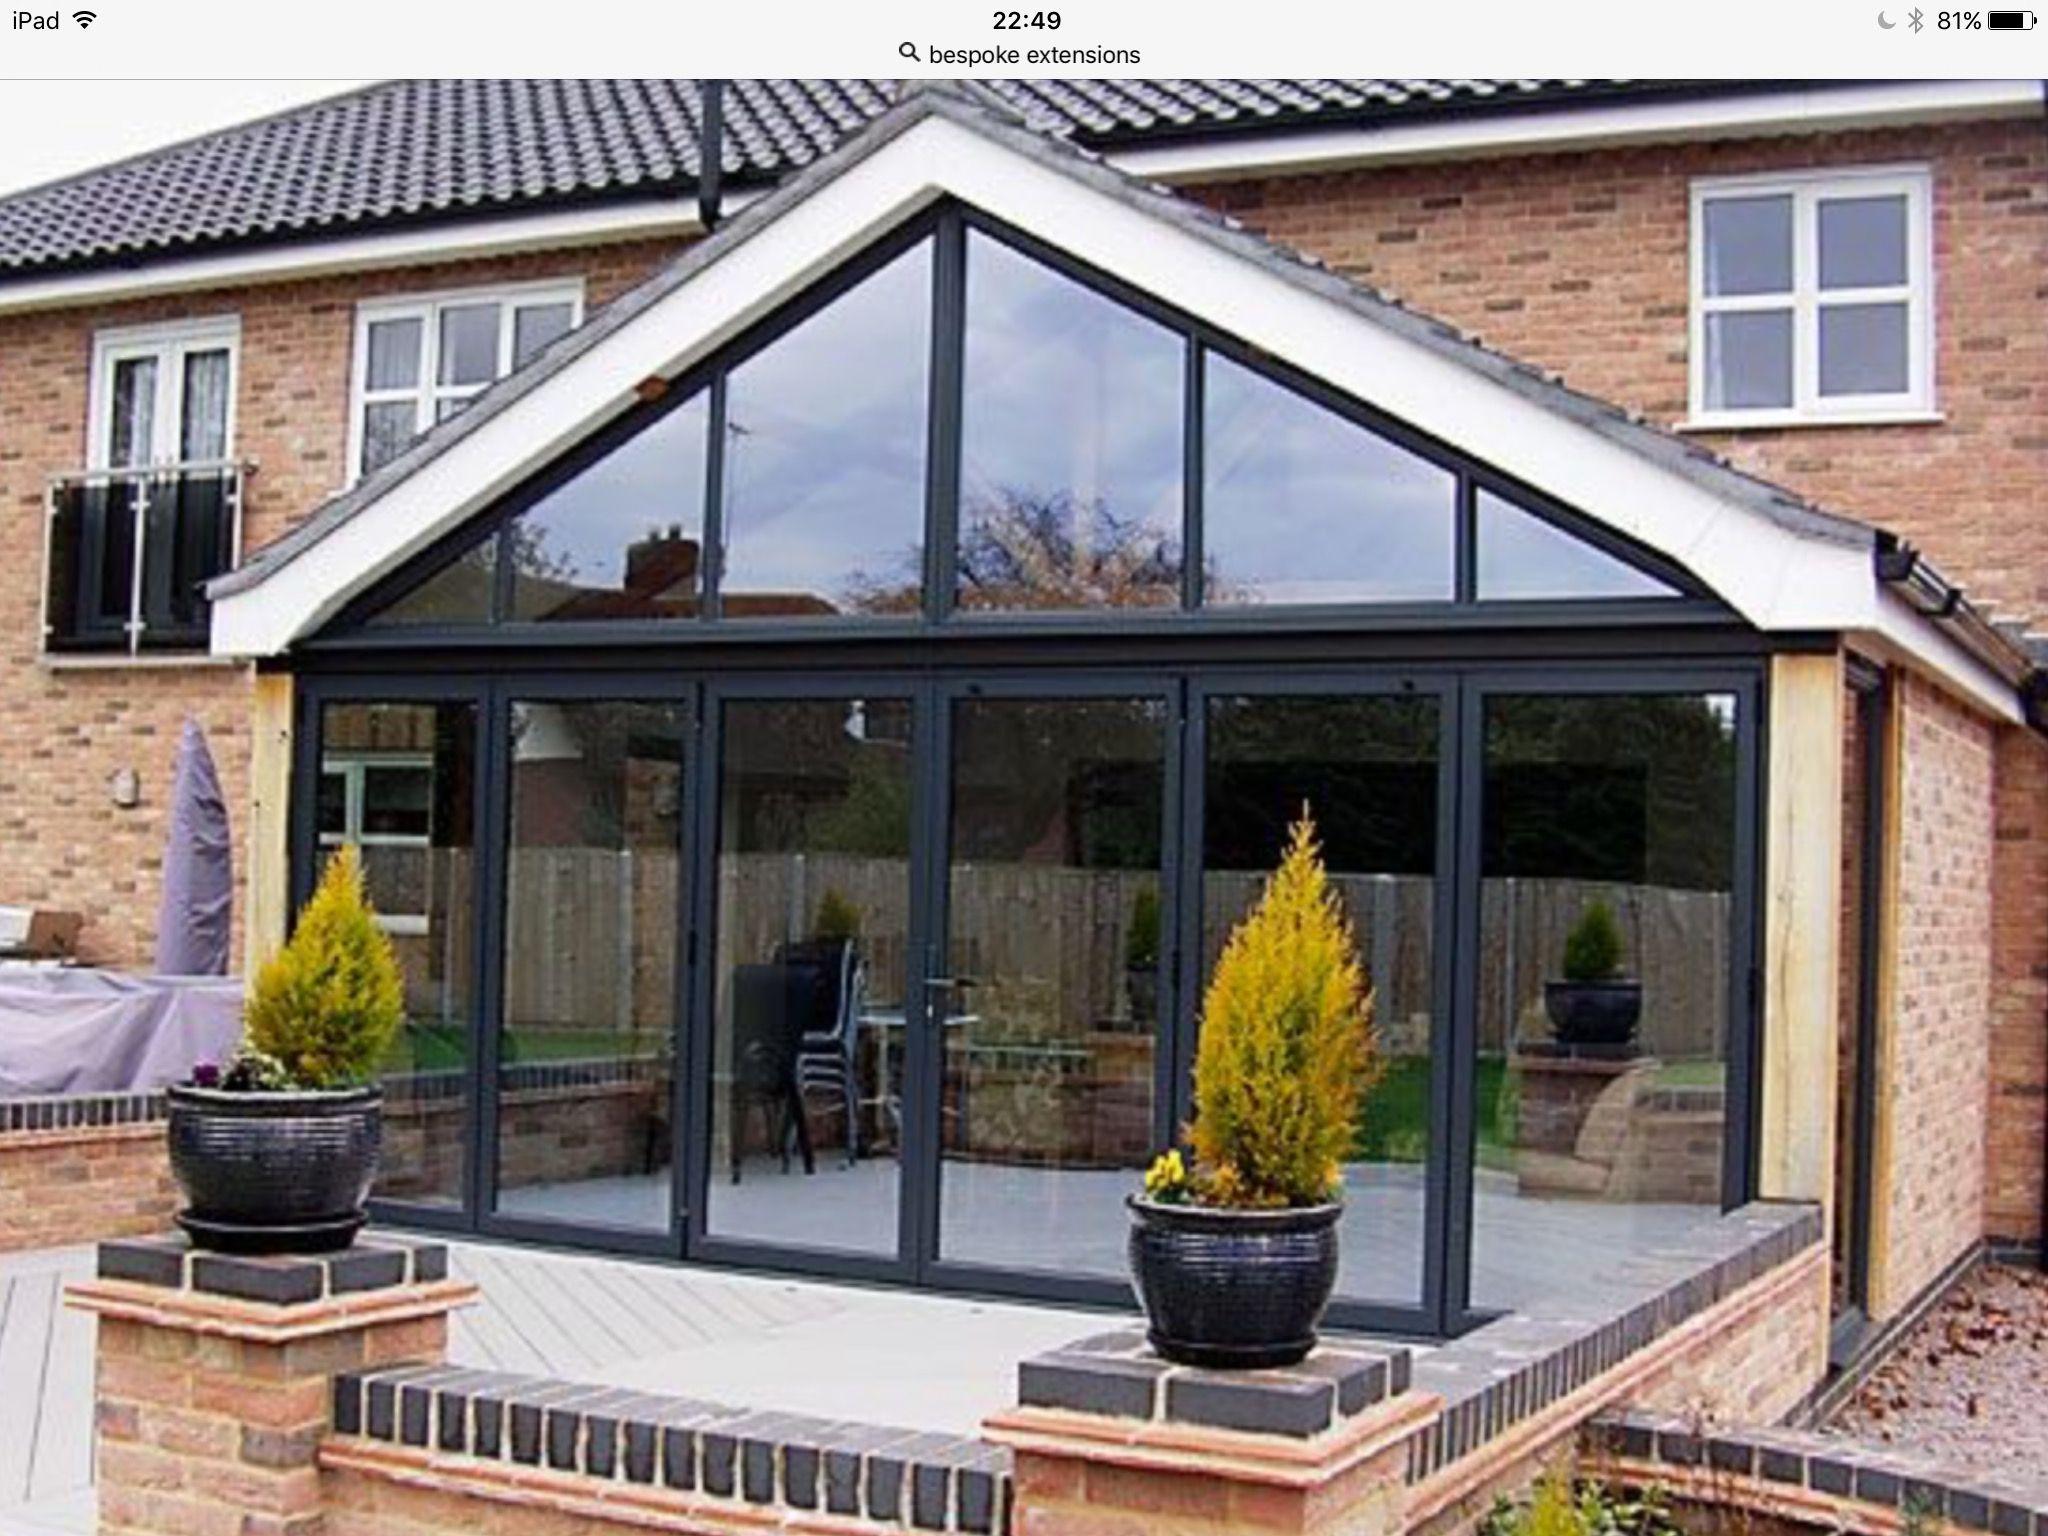 Gable end window ideas  pin by samantha mills on external doors  pinterest  doors house